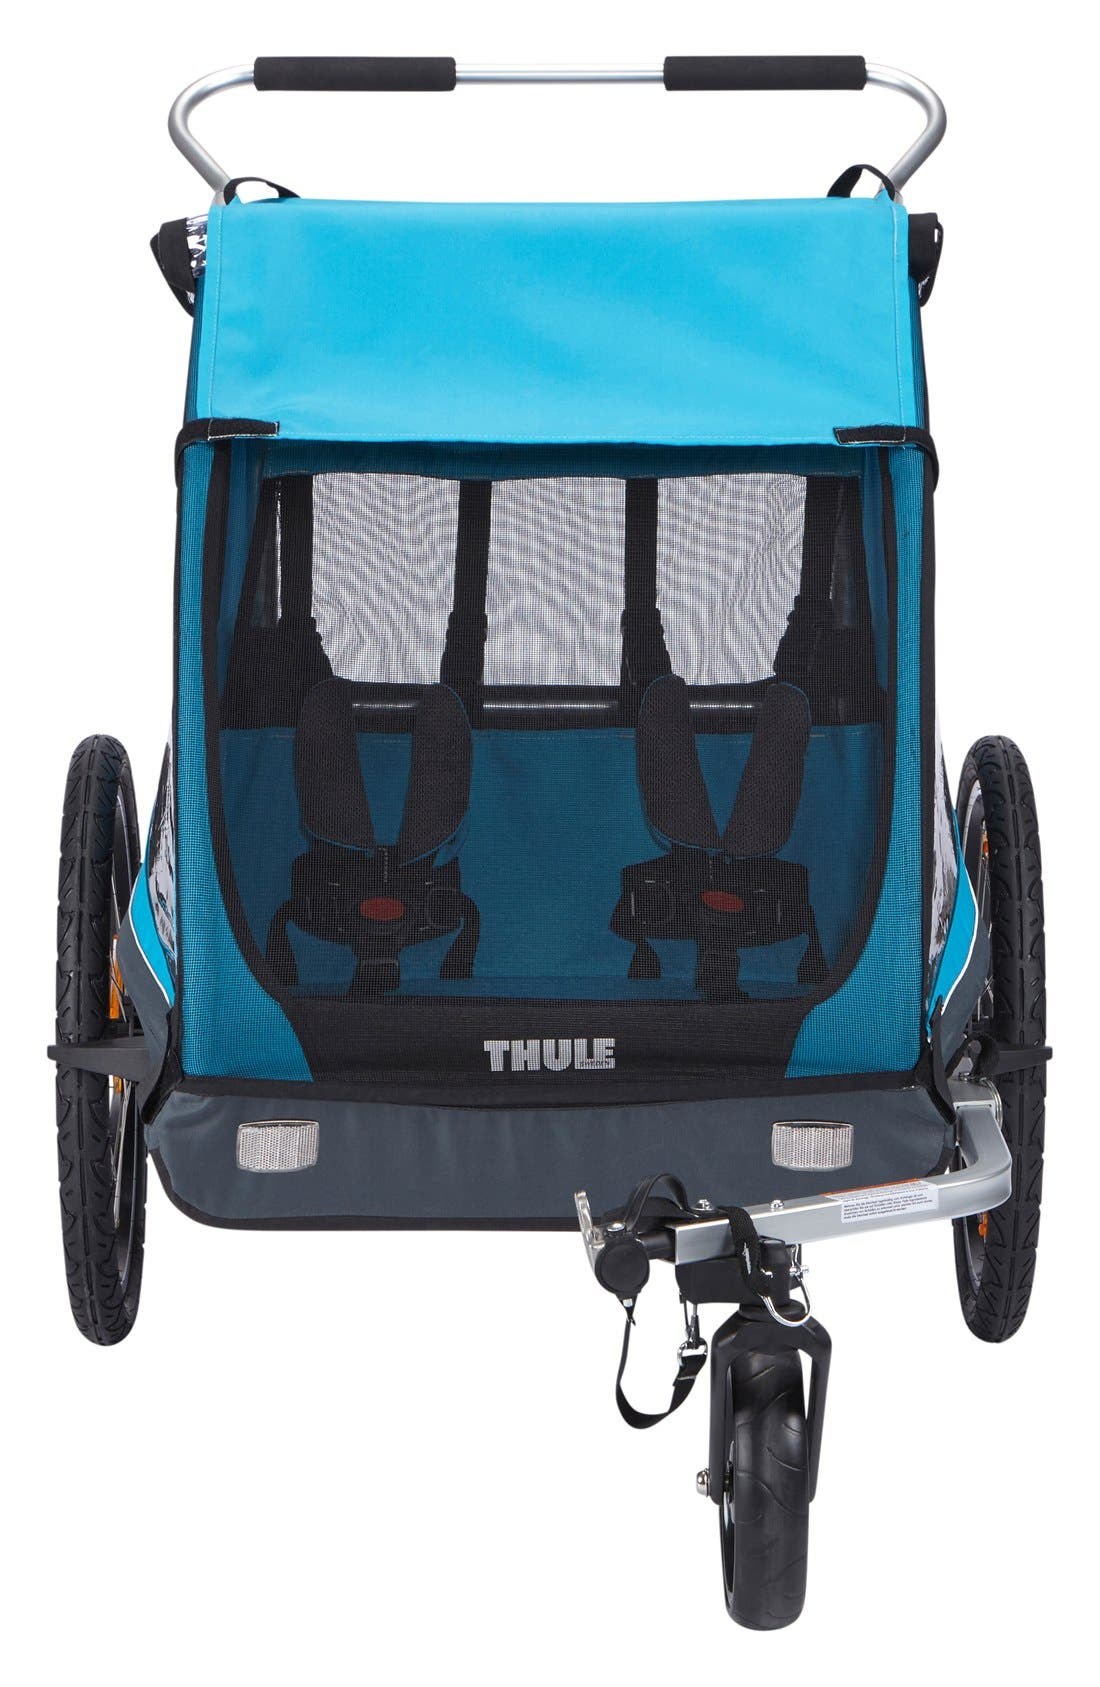 Coaster XT Double Seat Bike Trailer,                             Main thumbnail 1, color,                             BLUE